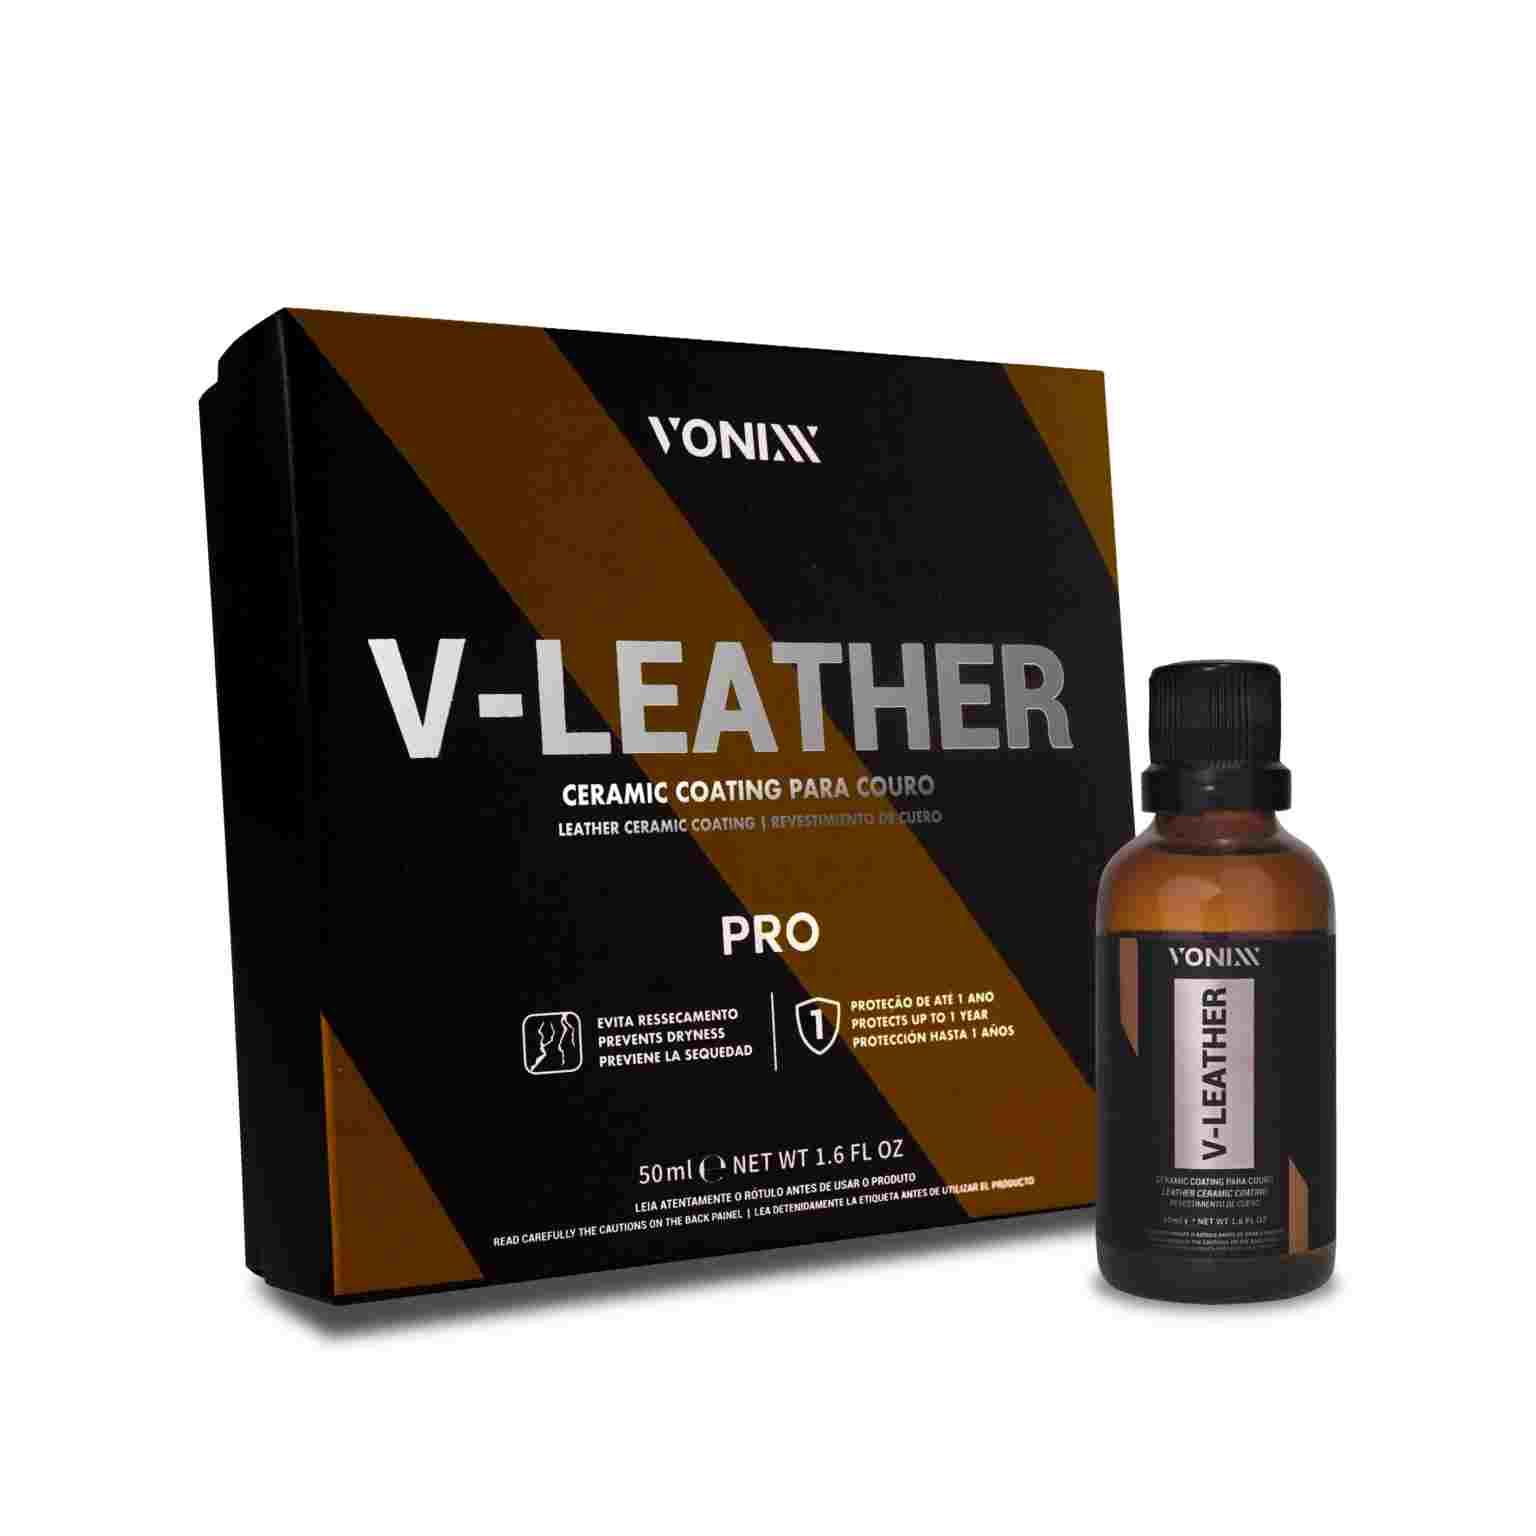 V-Leather Vitrificador De Couro 50ml - Vonixx